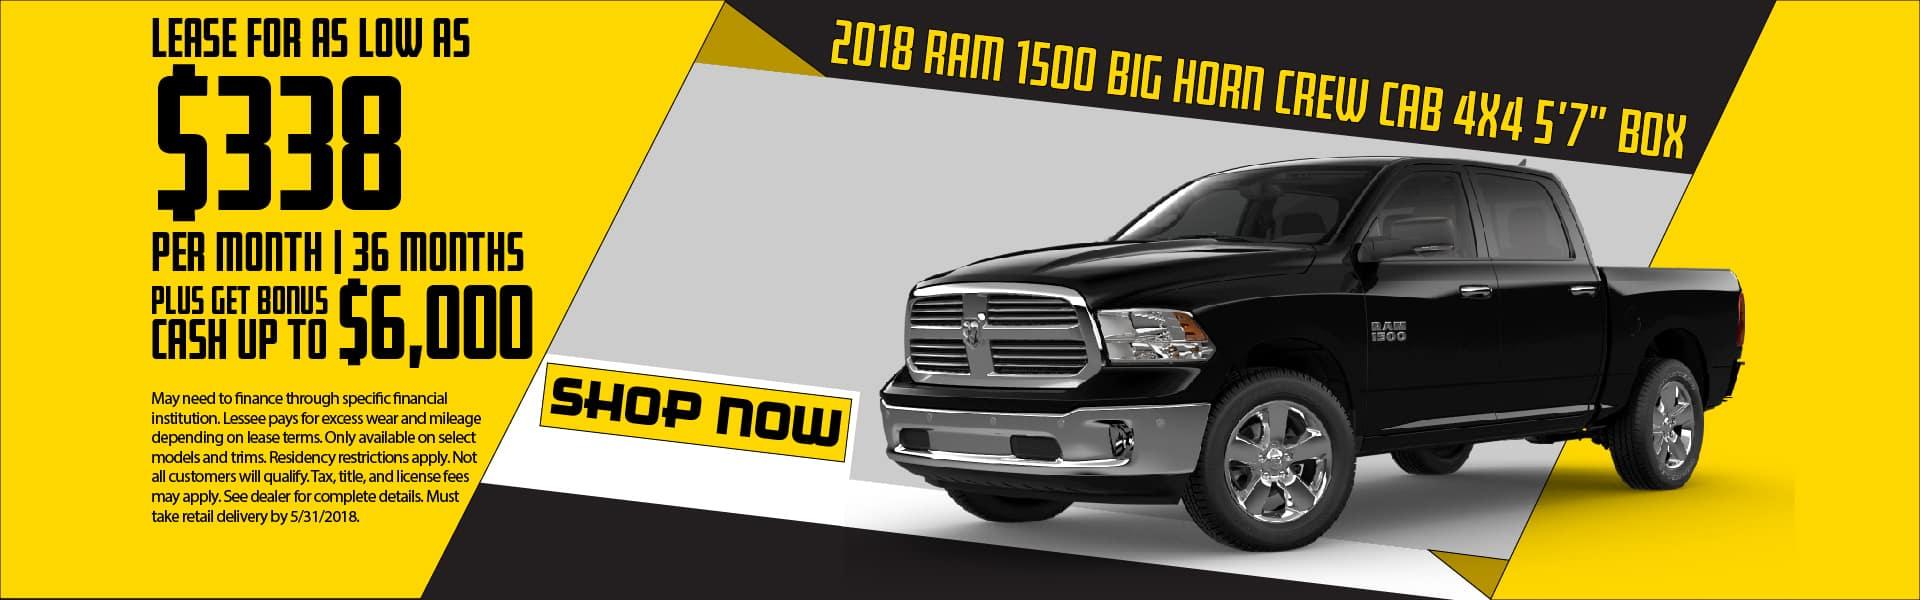 Tate Branch Hobbs Nm >> Tate Branch Hobbs CDJR | Chrysler, Dodge, Jeep, Ram Dealer ...